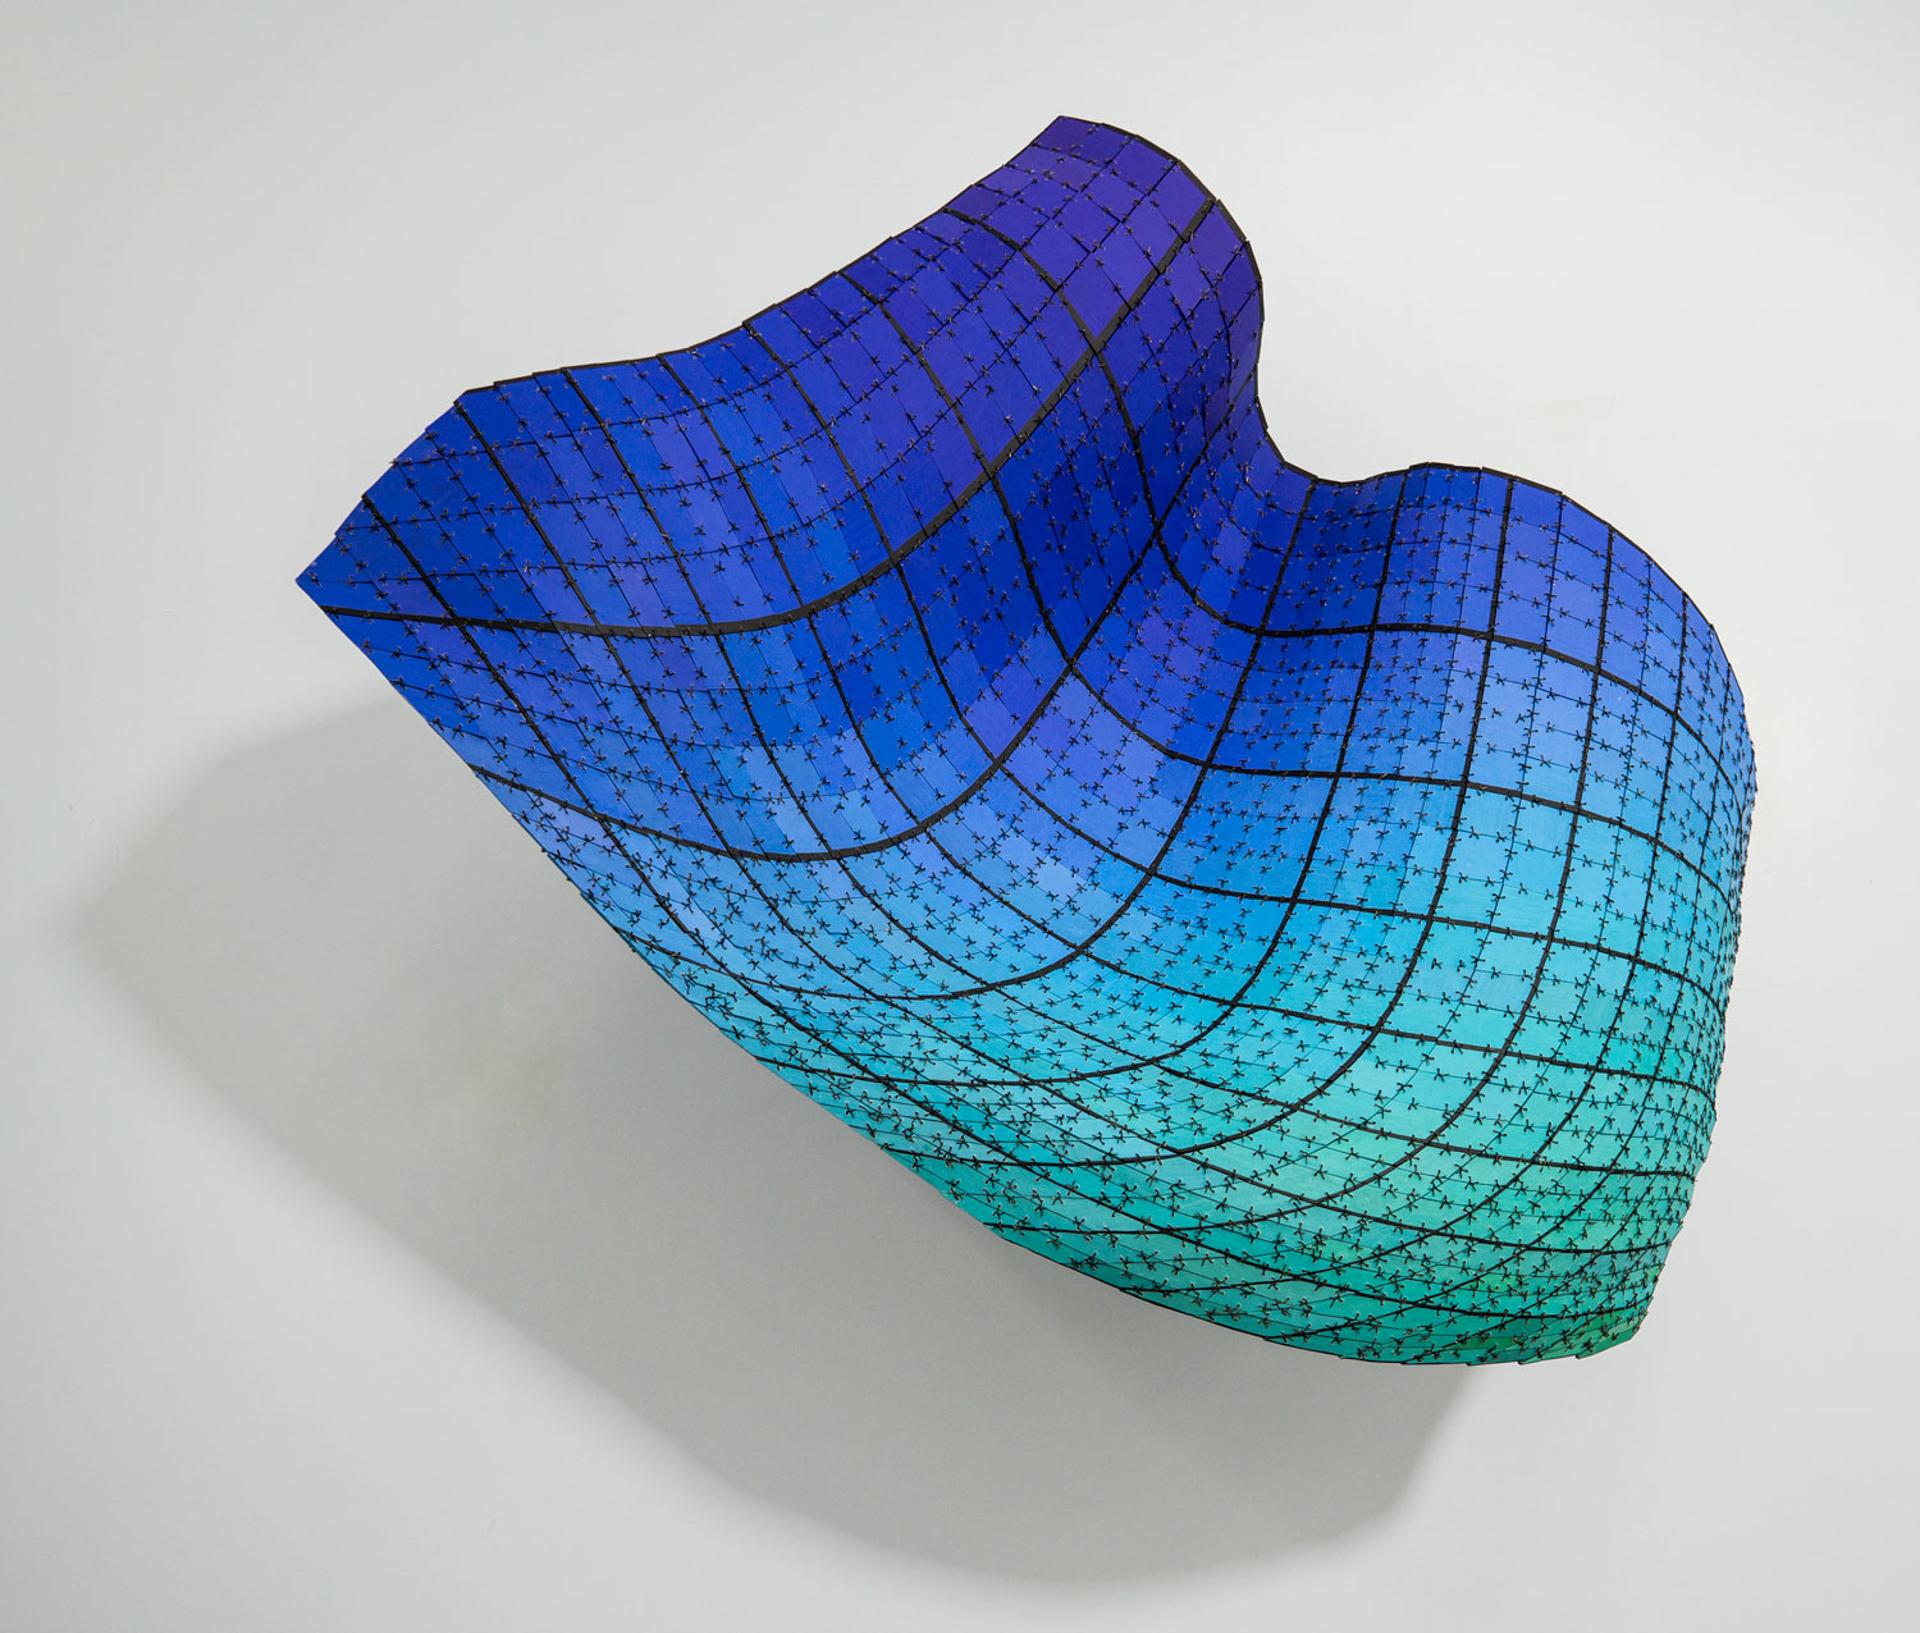 ICS2018seagrnturqprp by Sydney Blum